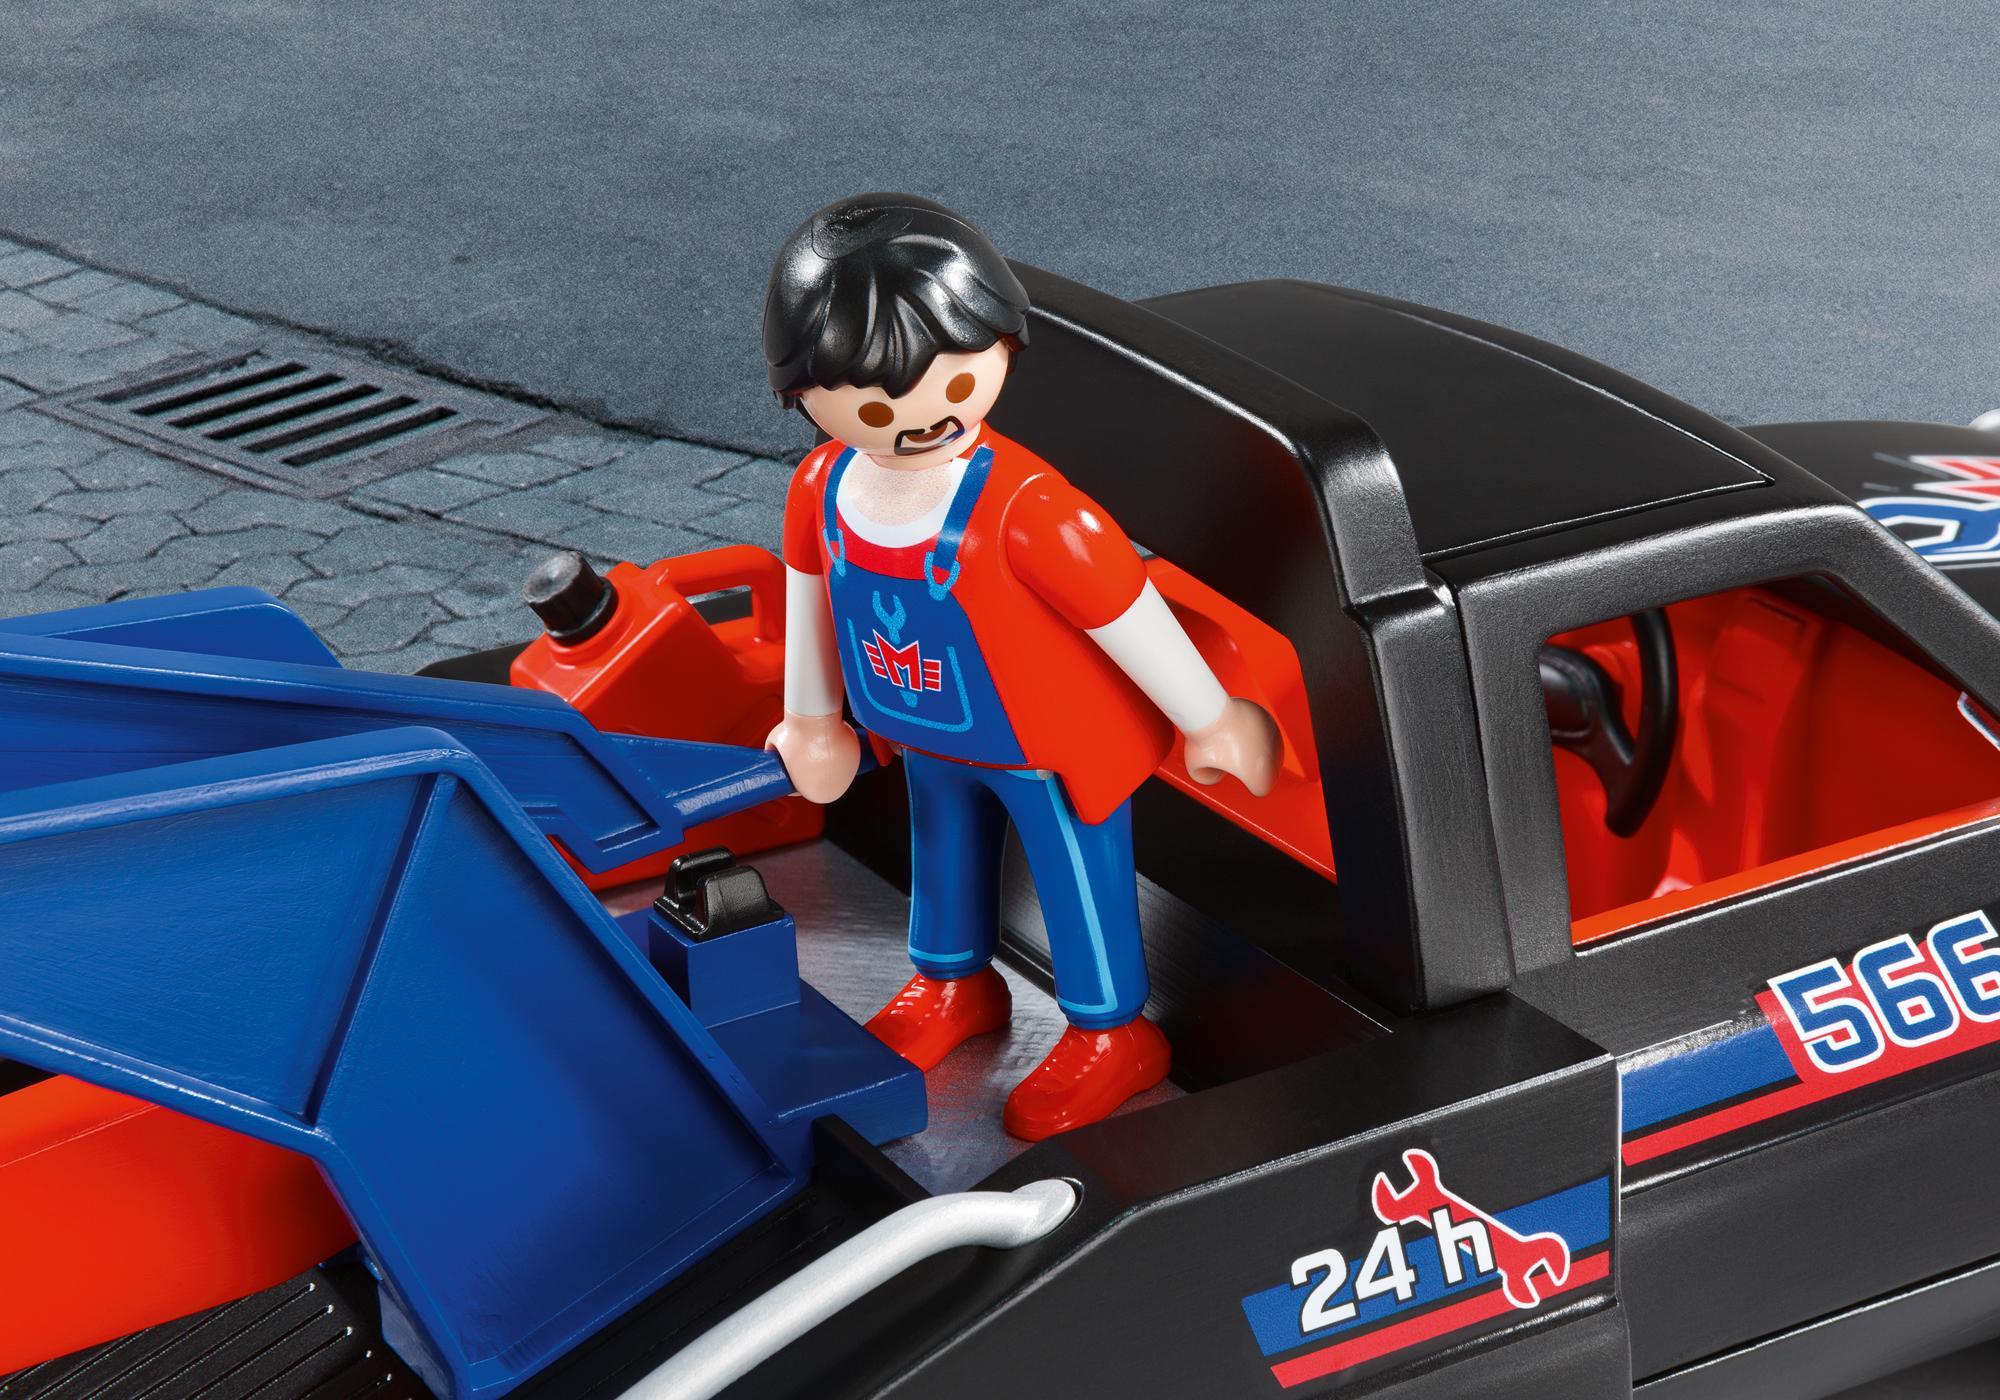 http://media.playmobil.com/i/playmobil/5664_product_extra1/Tow Truck